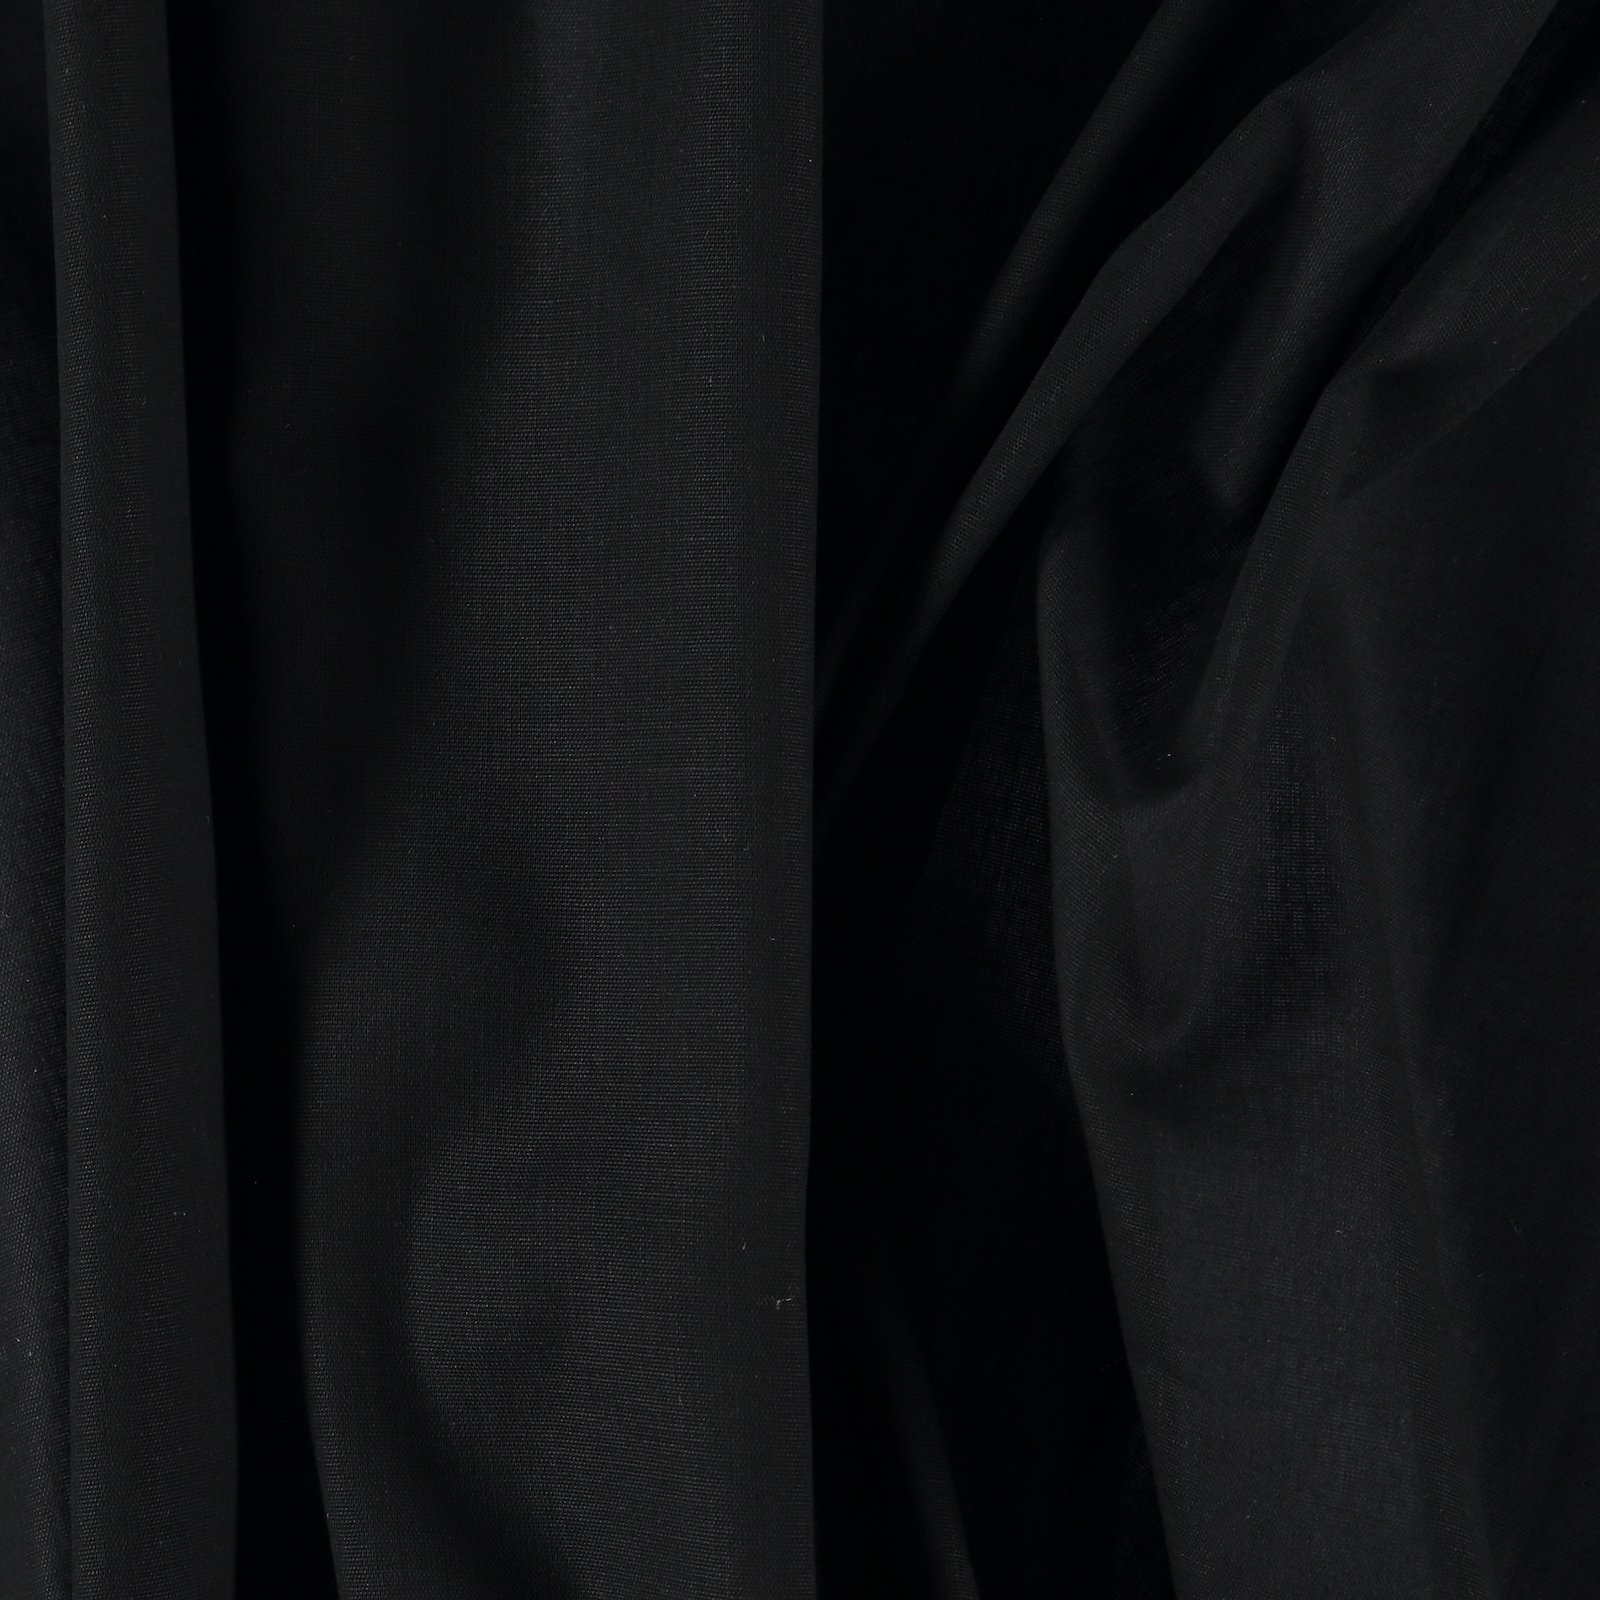 Light woven cotton black